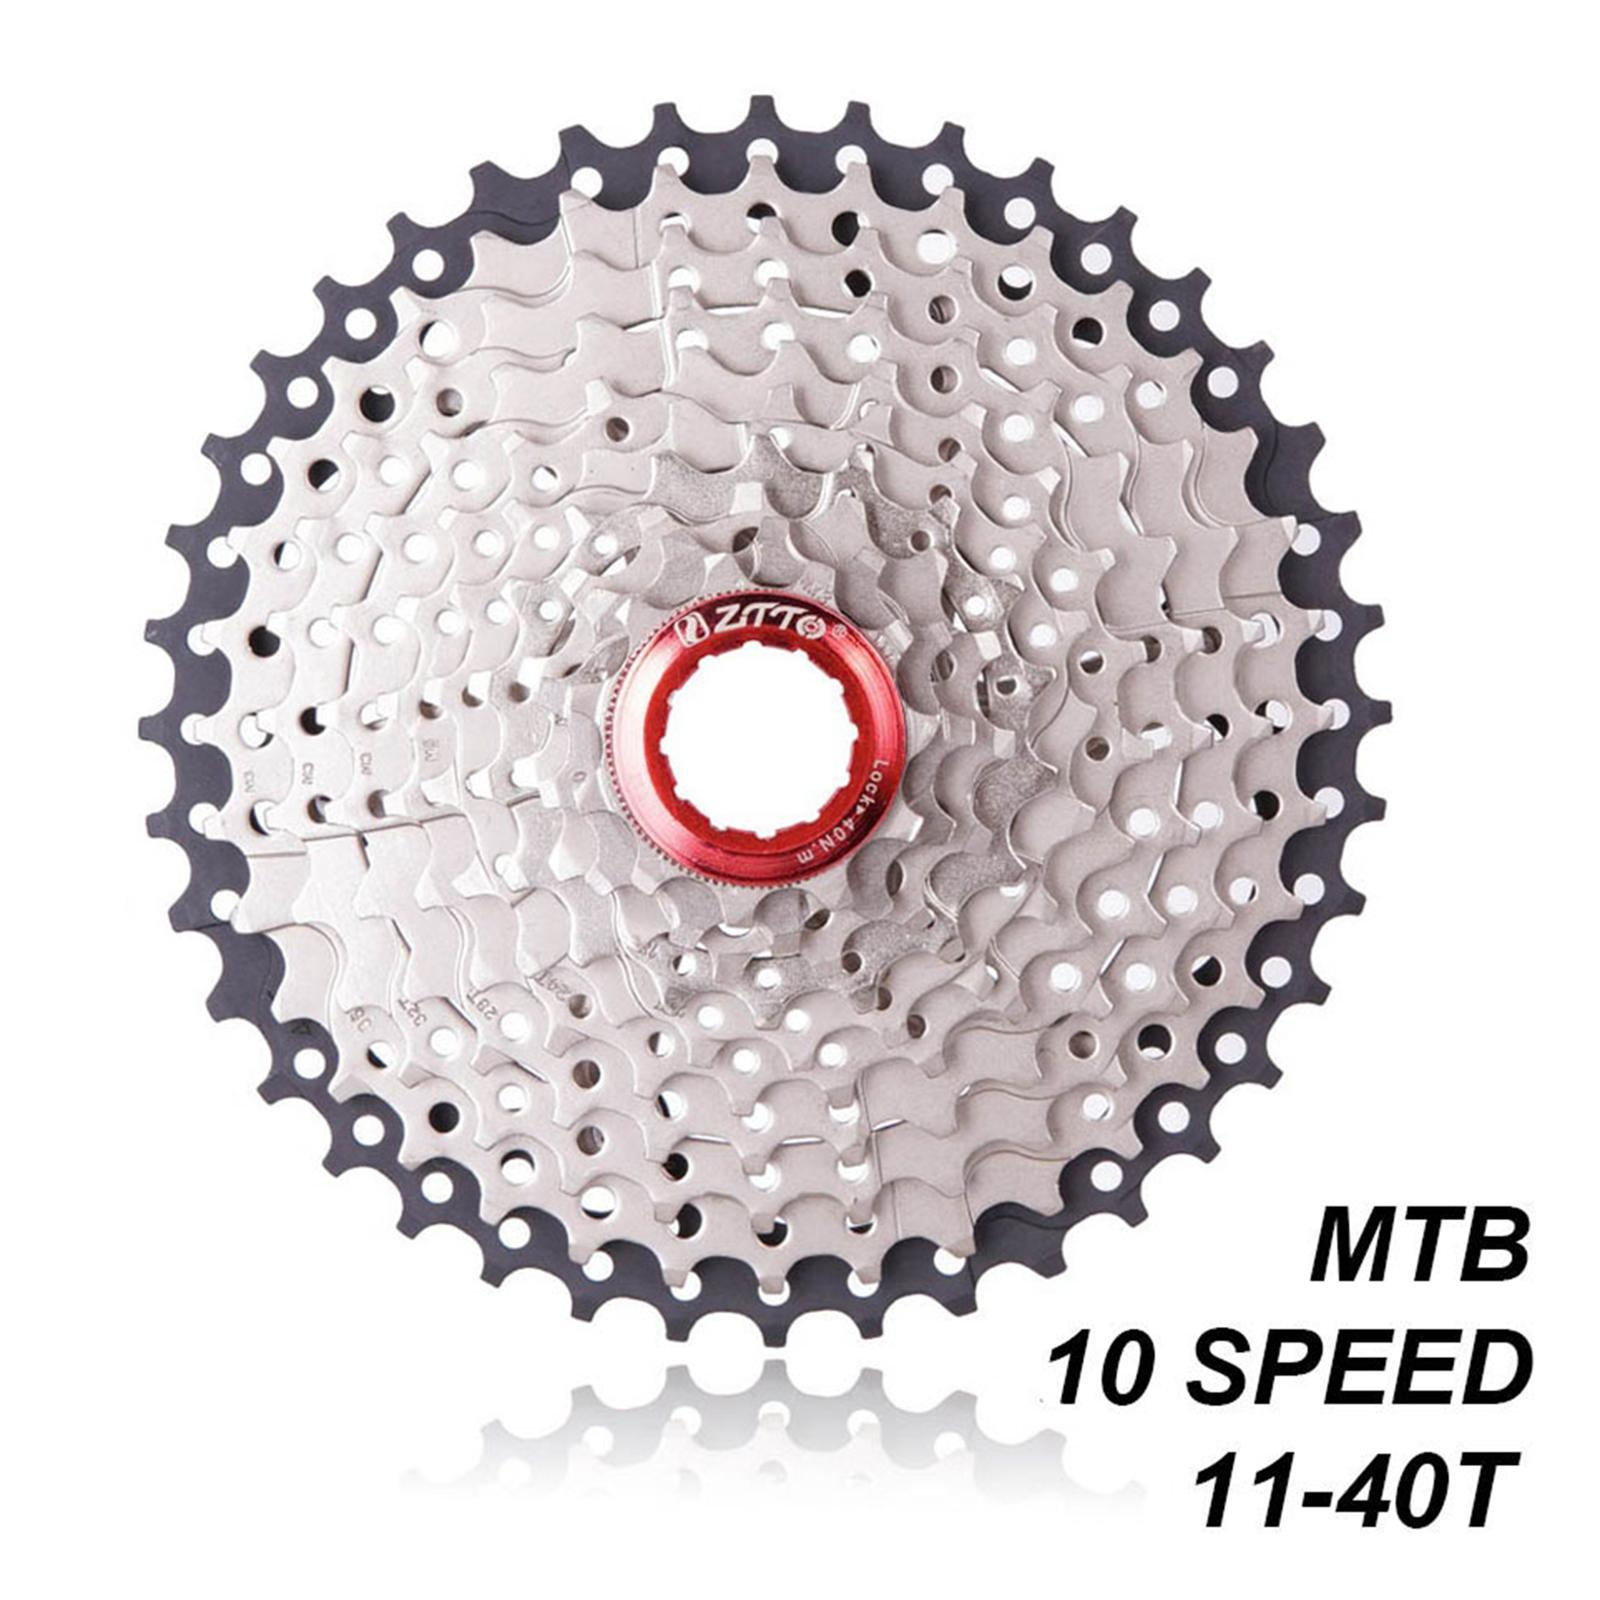 MTB Road Bike Bicycle Cassette Freewheel 8 9 10 Speed Flywheel Sprocket Gear